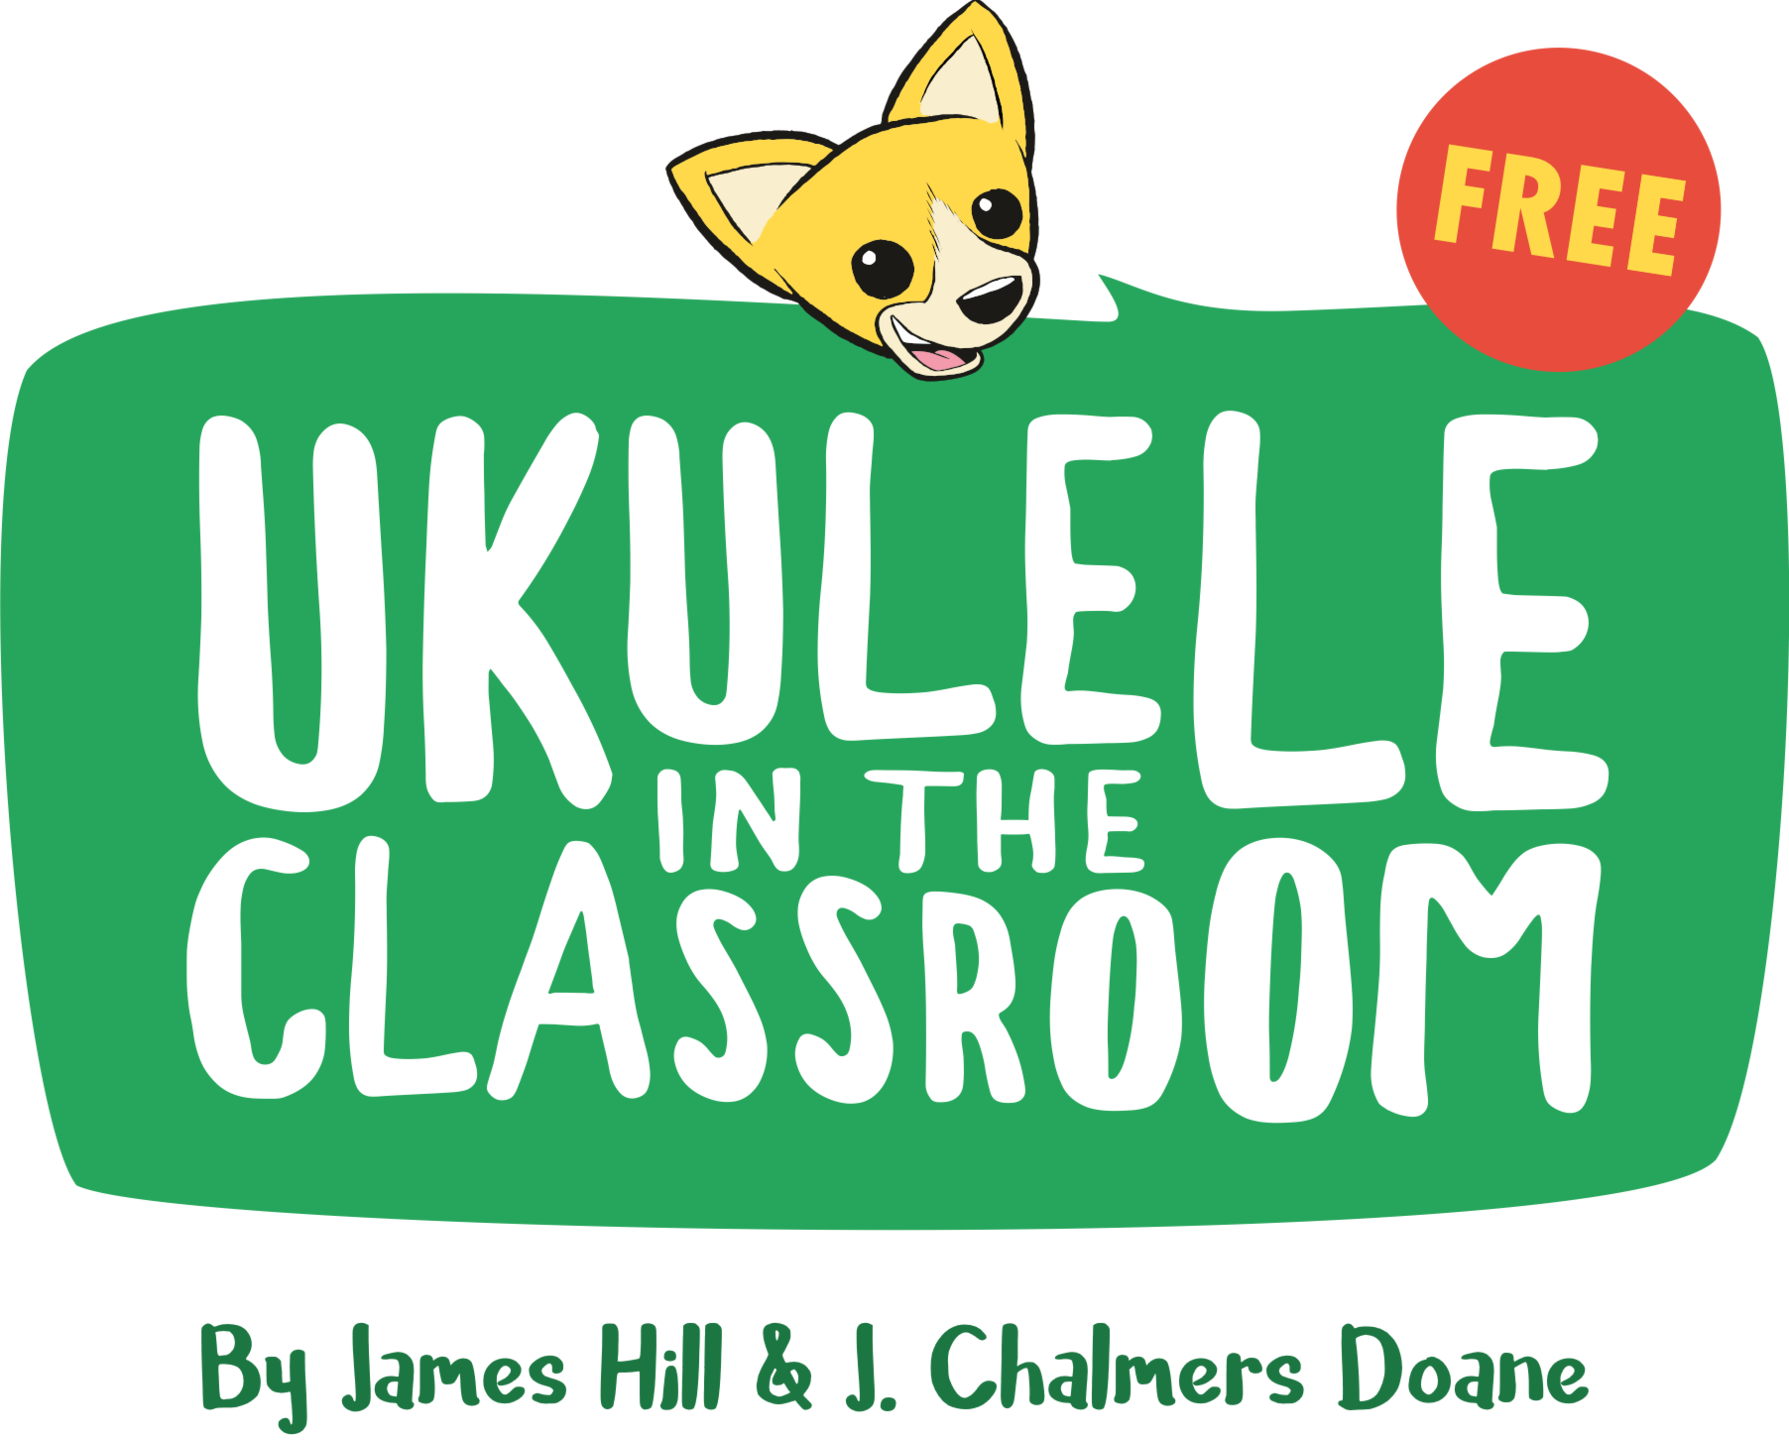 Ukulele in the Classroom